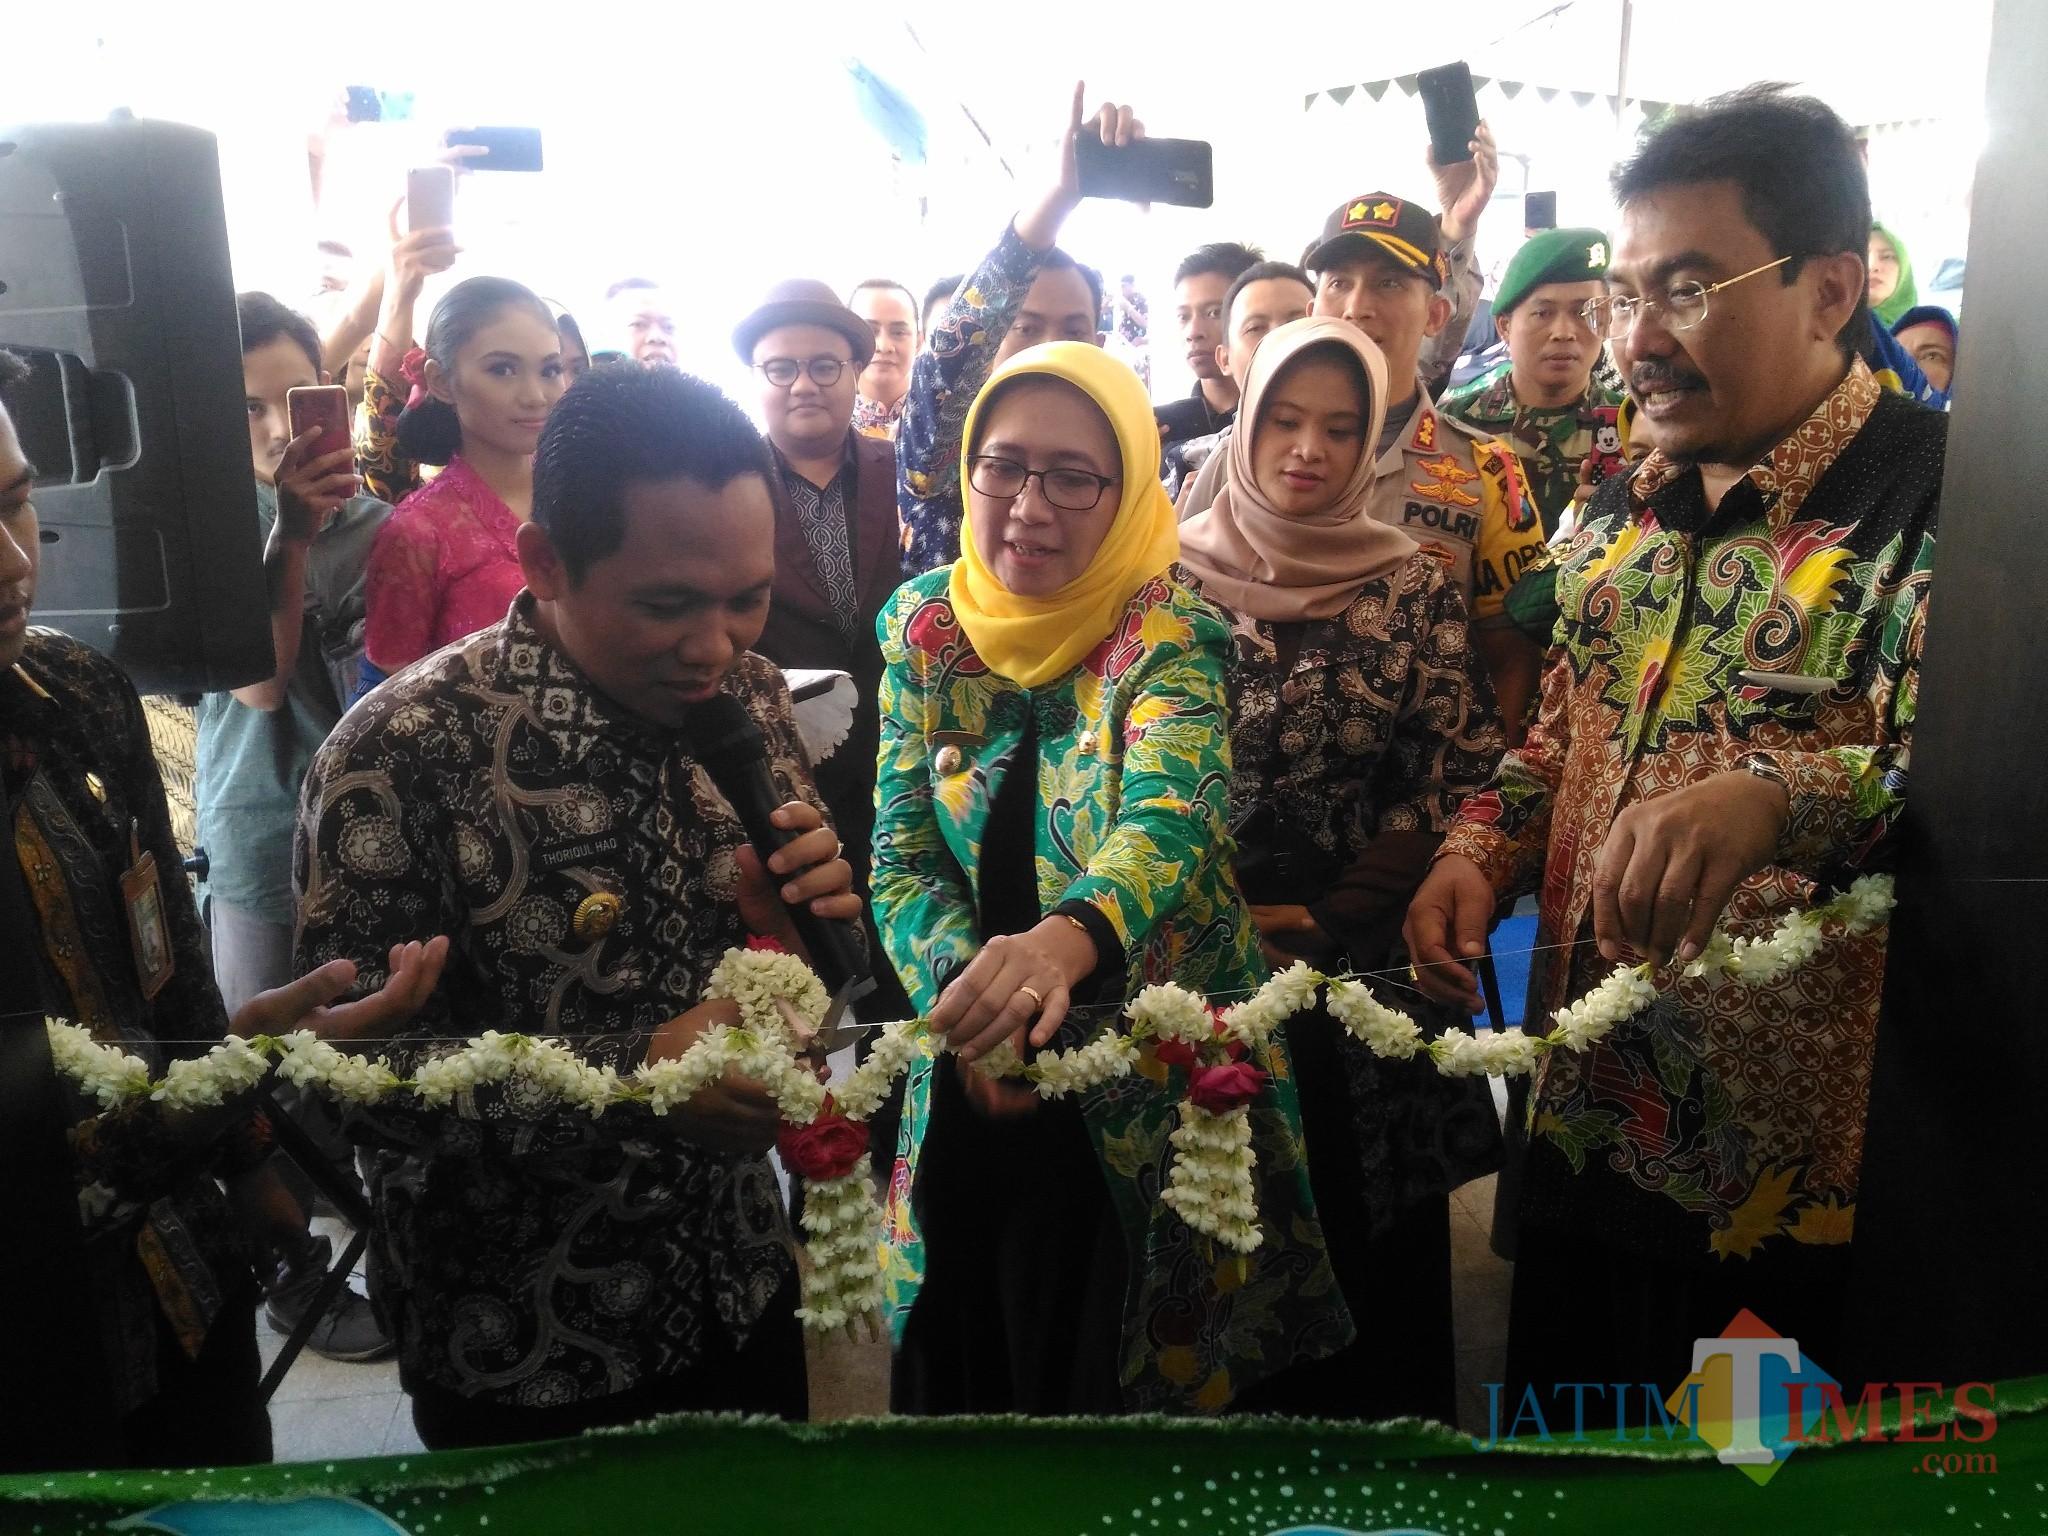 Bupati Lumajang H. Thoriqul Haq ketika meresmikan Graha Batik New Lataza (Foto : Moch. R. Abdul Fatah / Jatim TIMES)